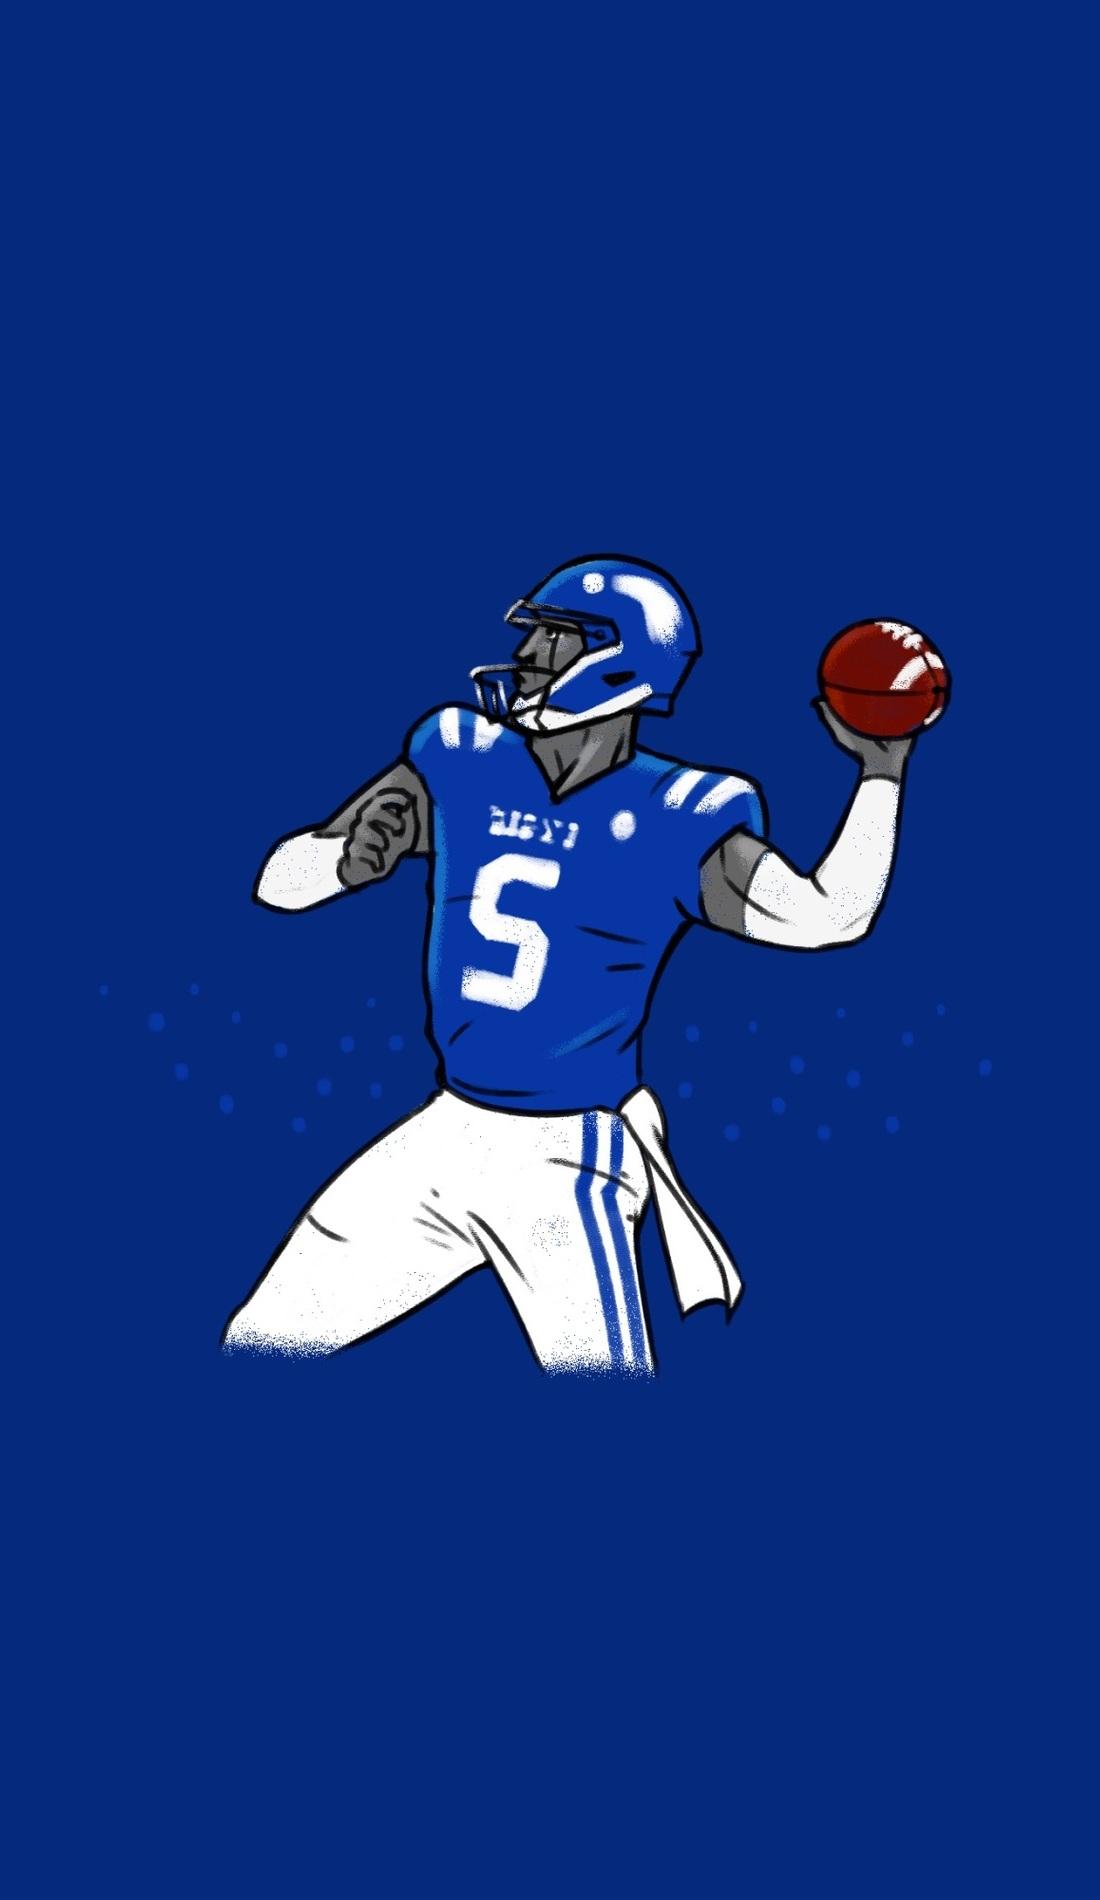 A Duke Blue Devils Football live event